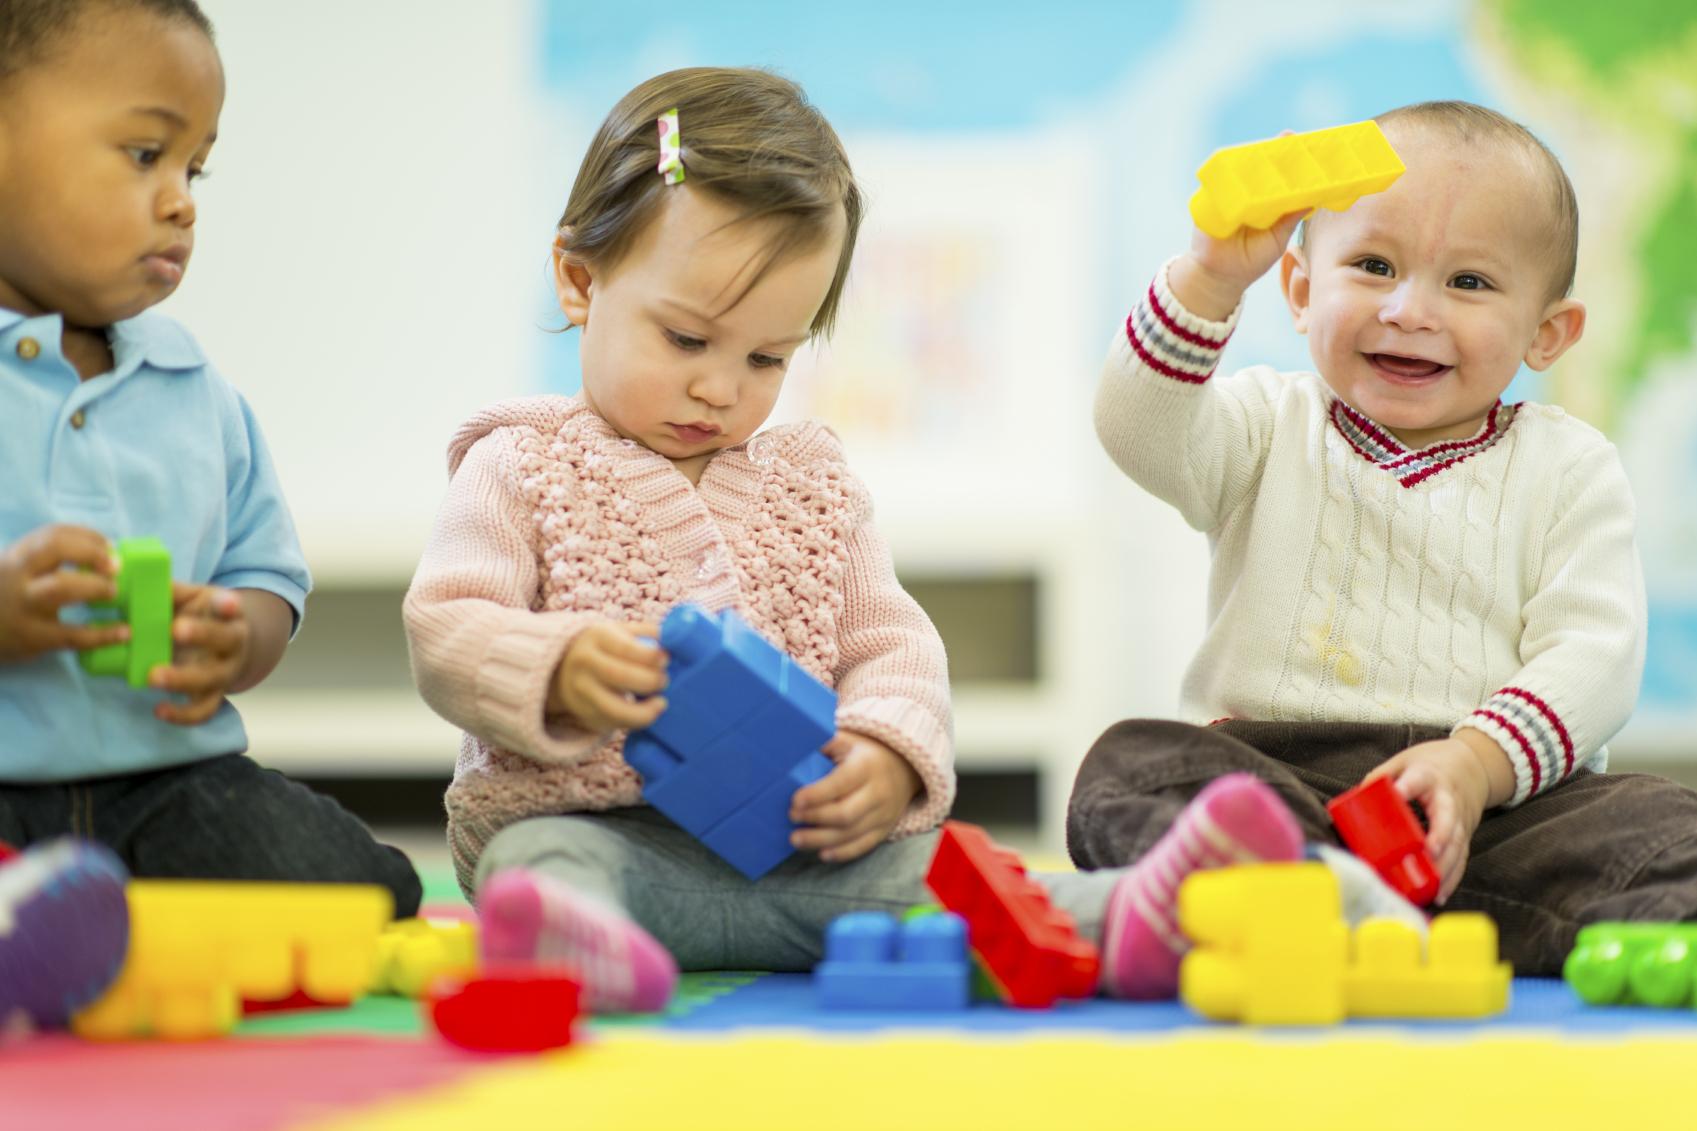 Resultado de imagen para babies playing togheter